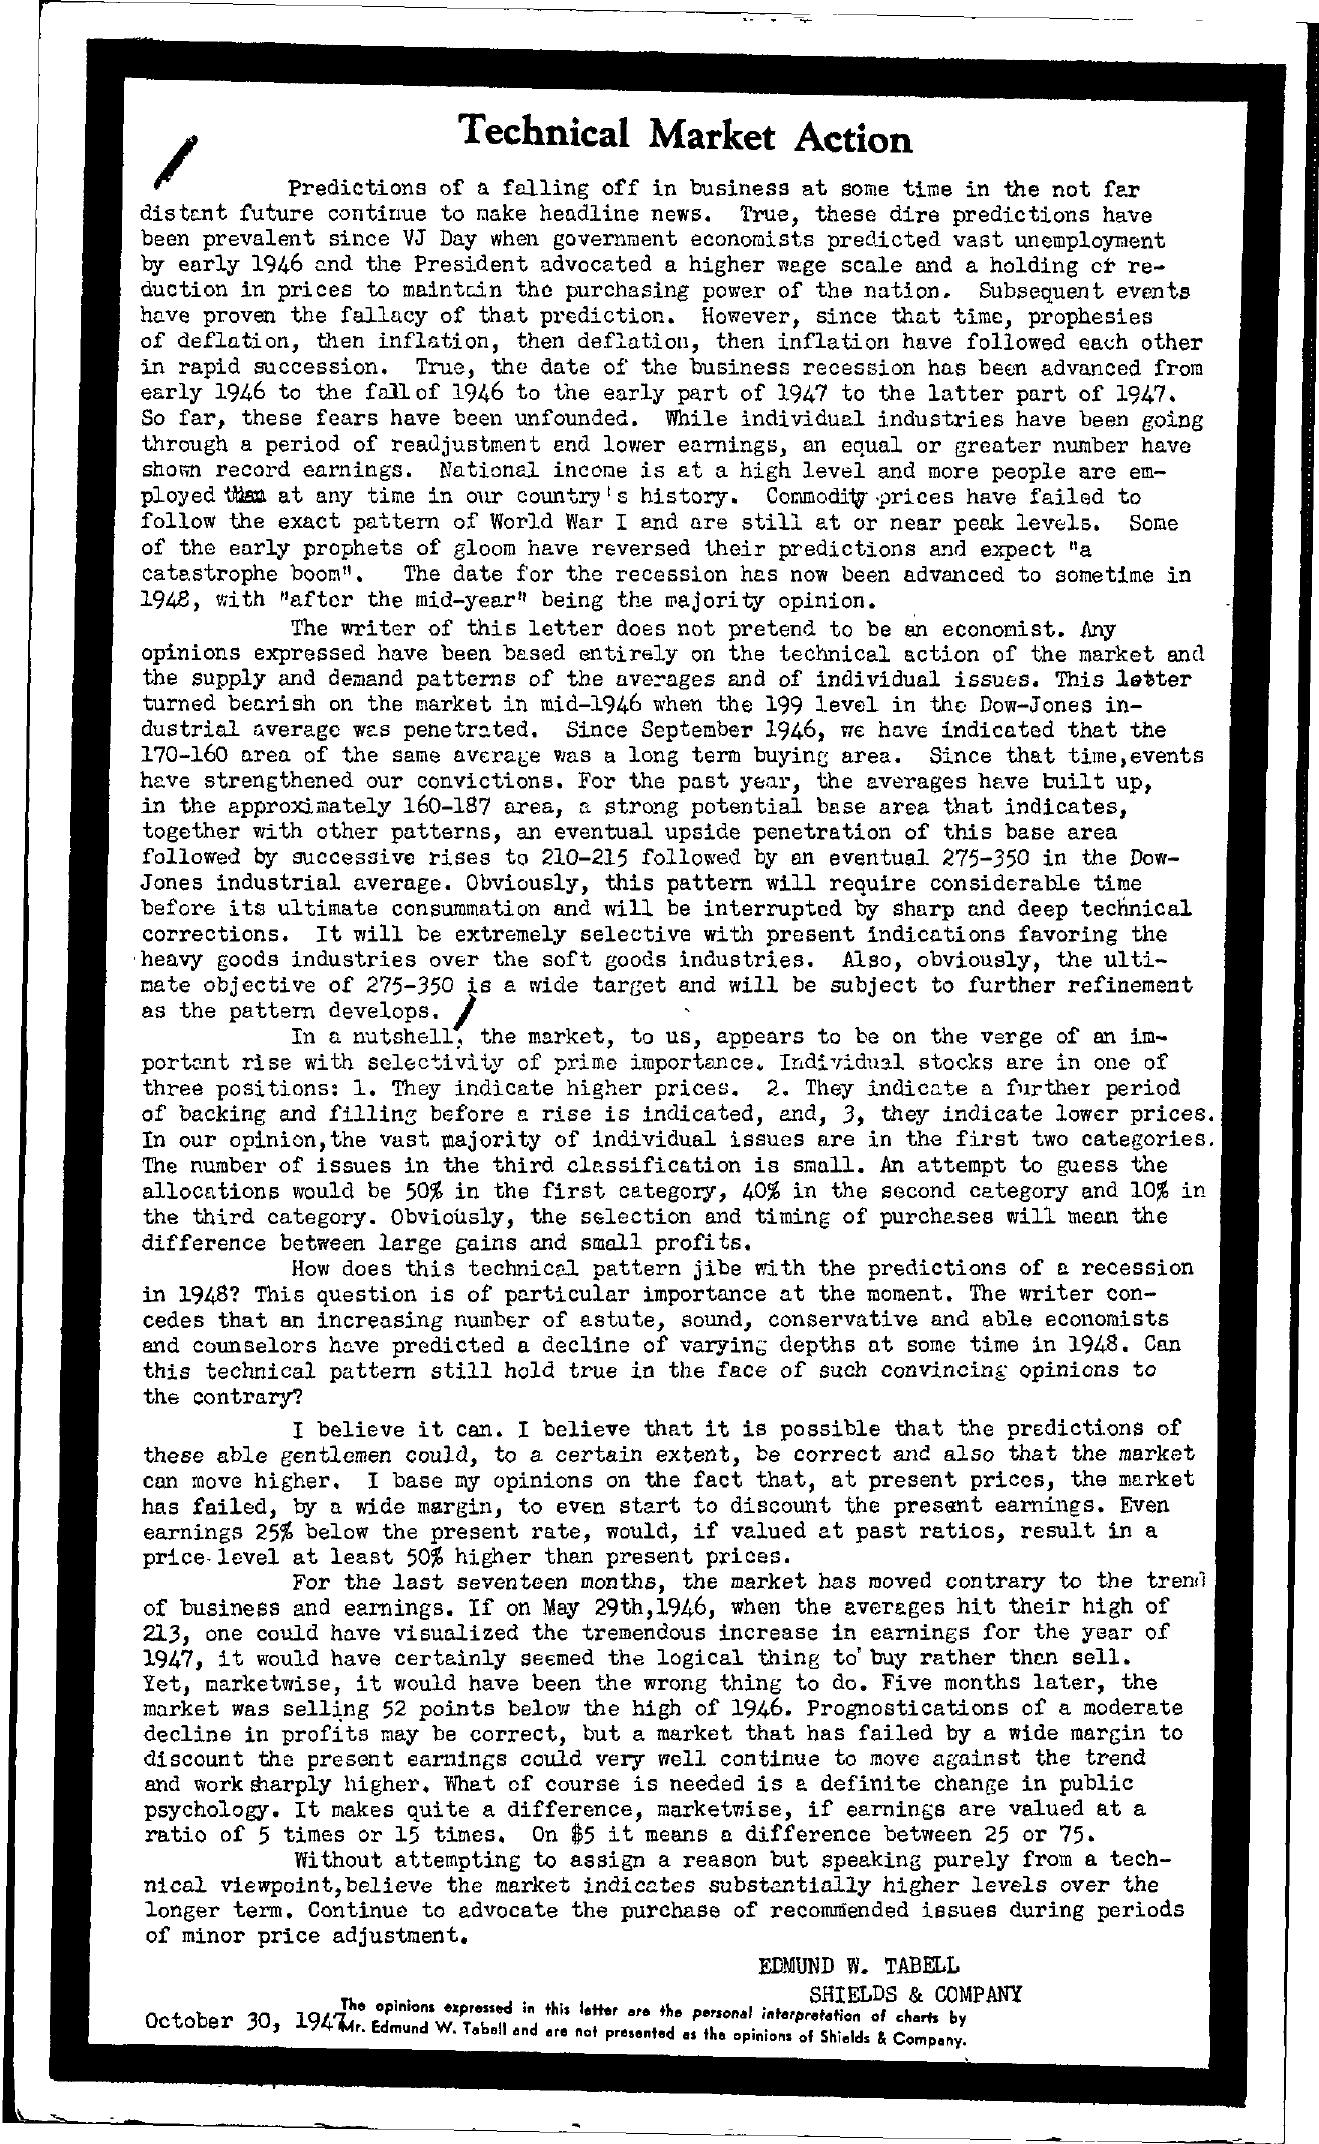 Tabell's Market Letter - October 30, 1947